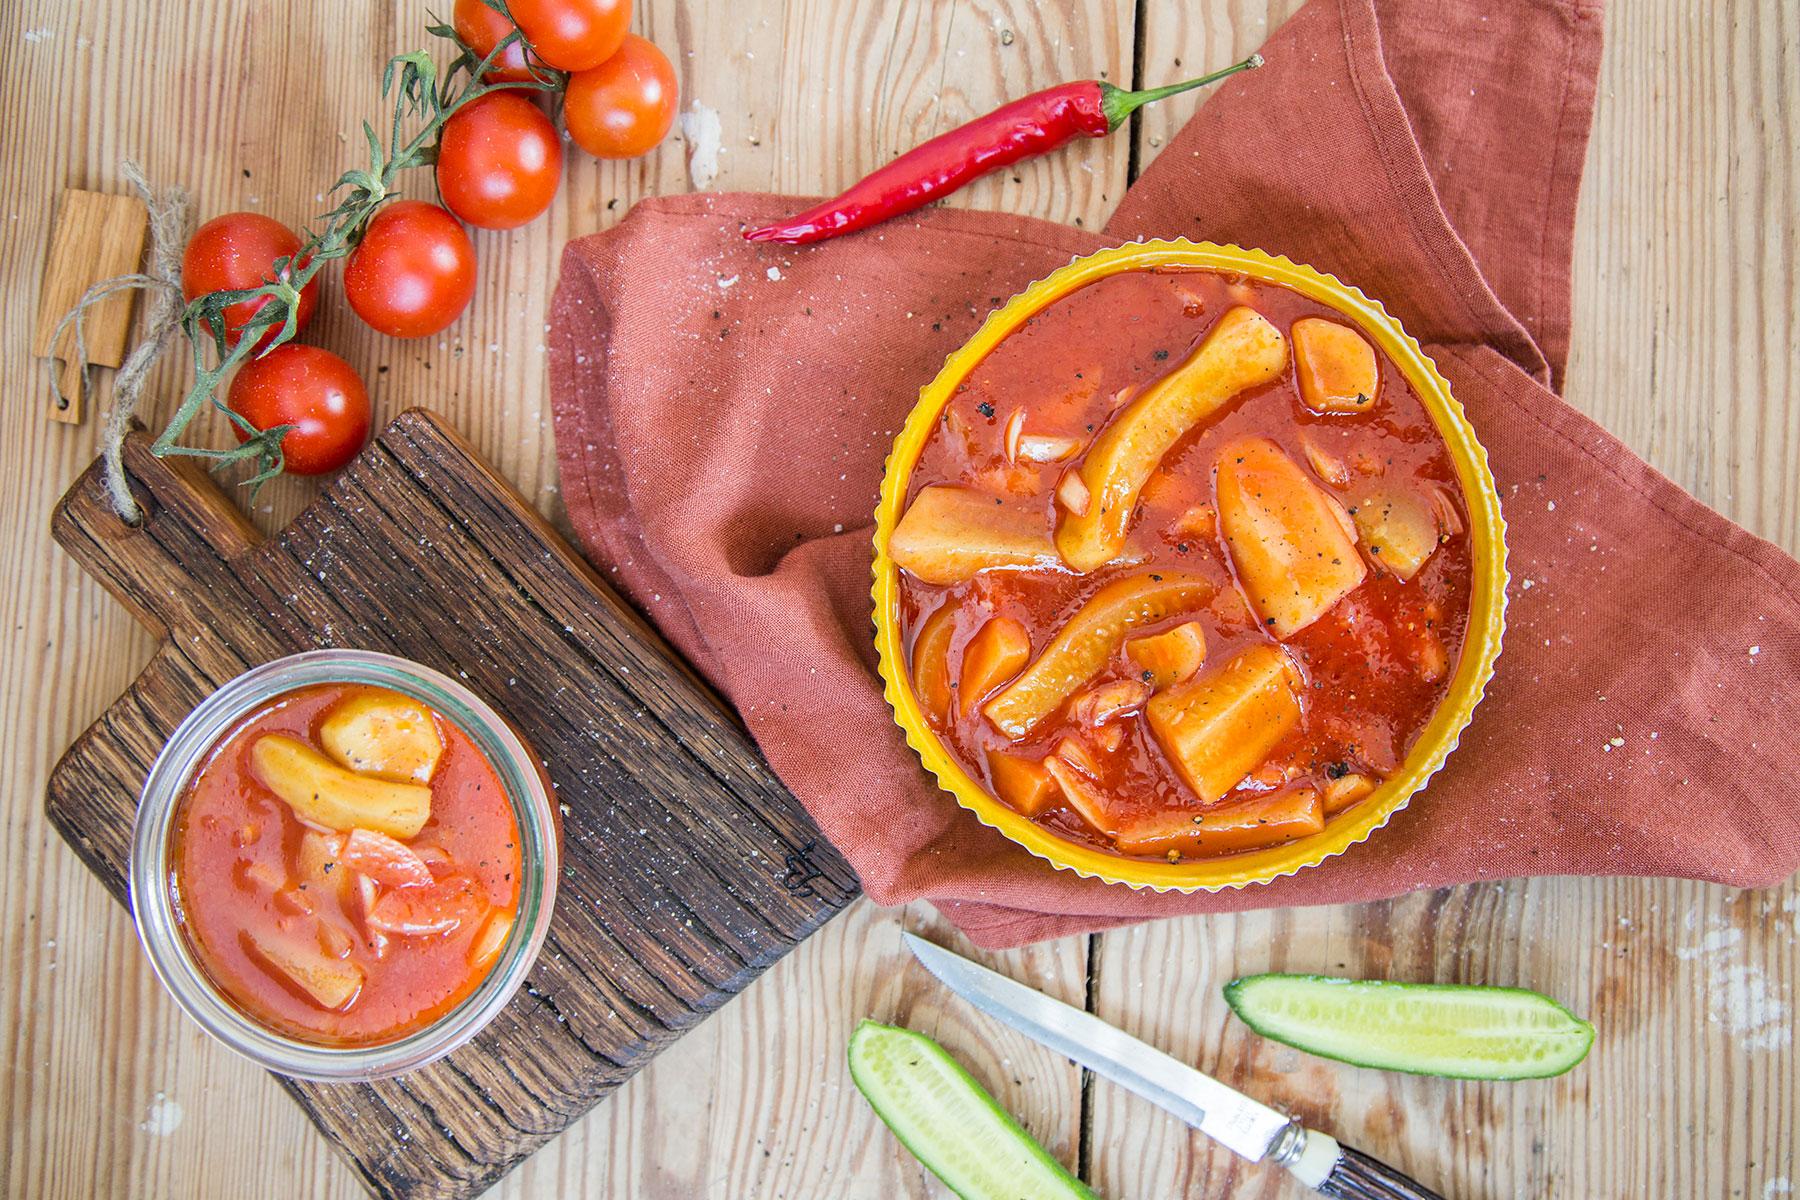 ogórki z pomidorach